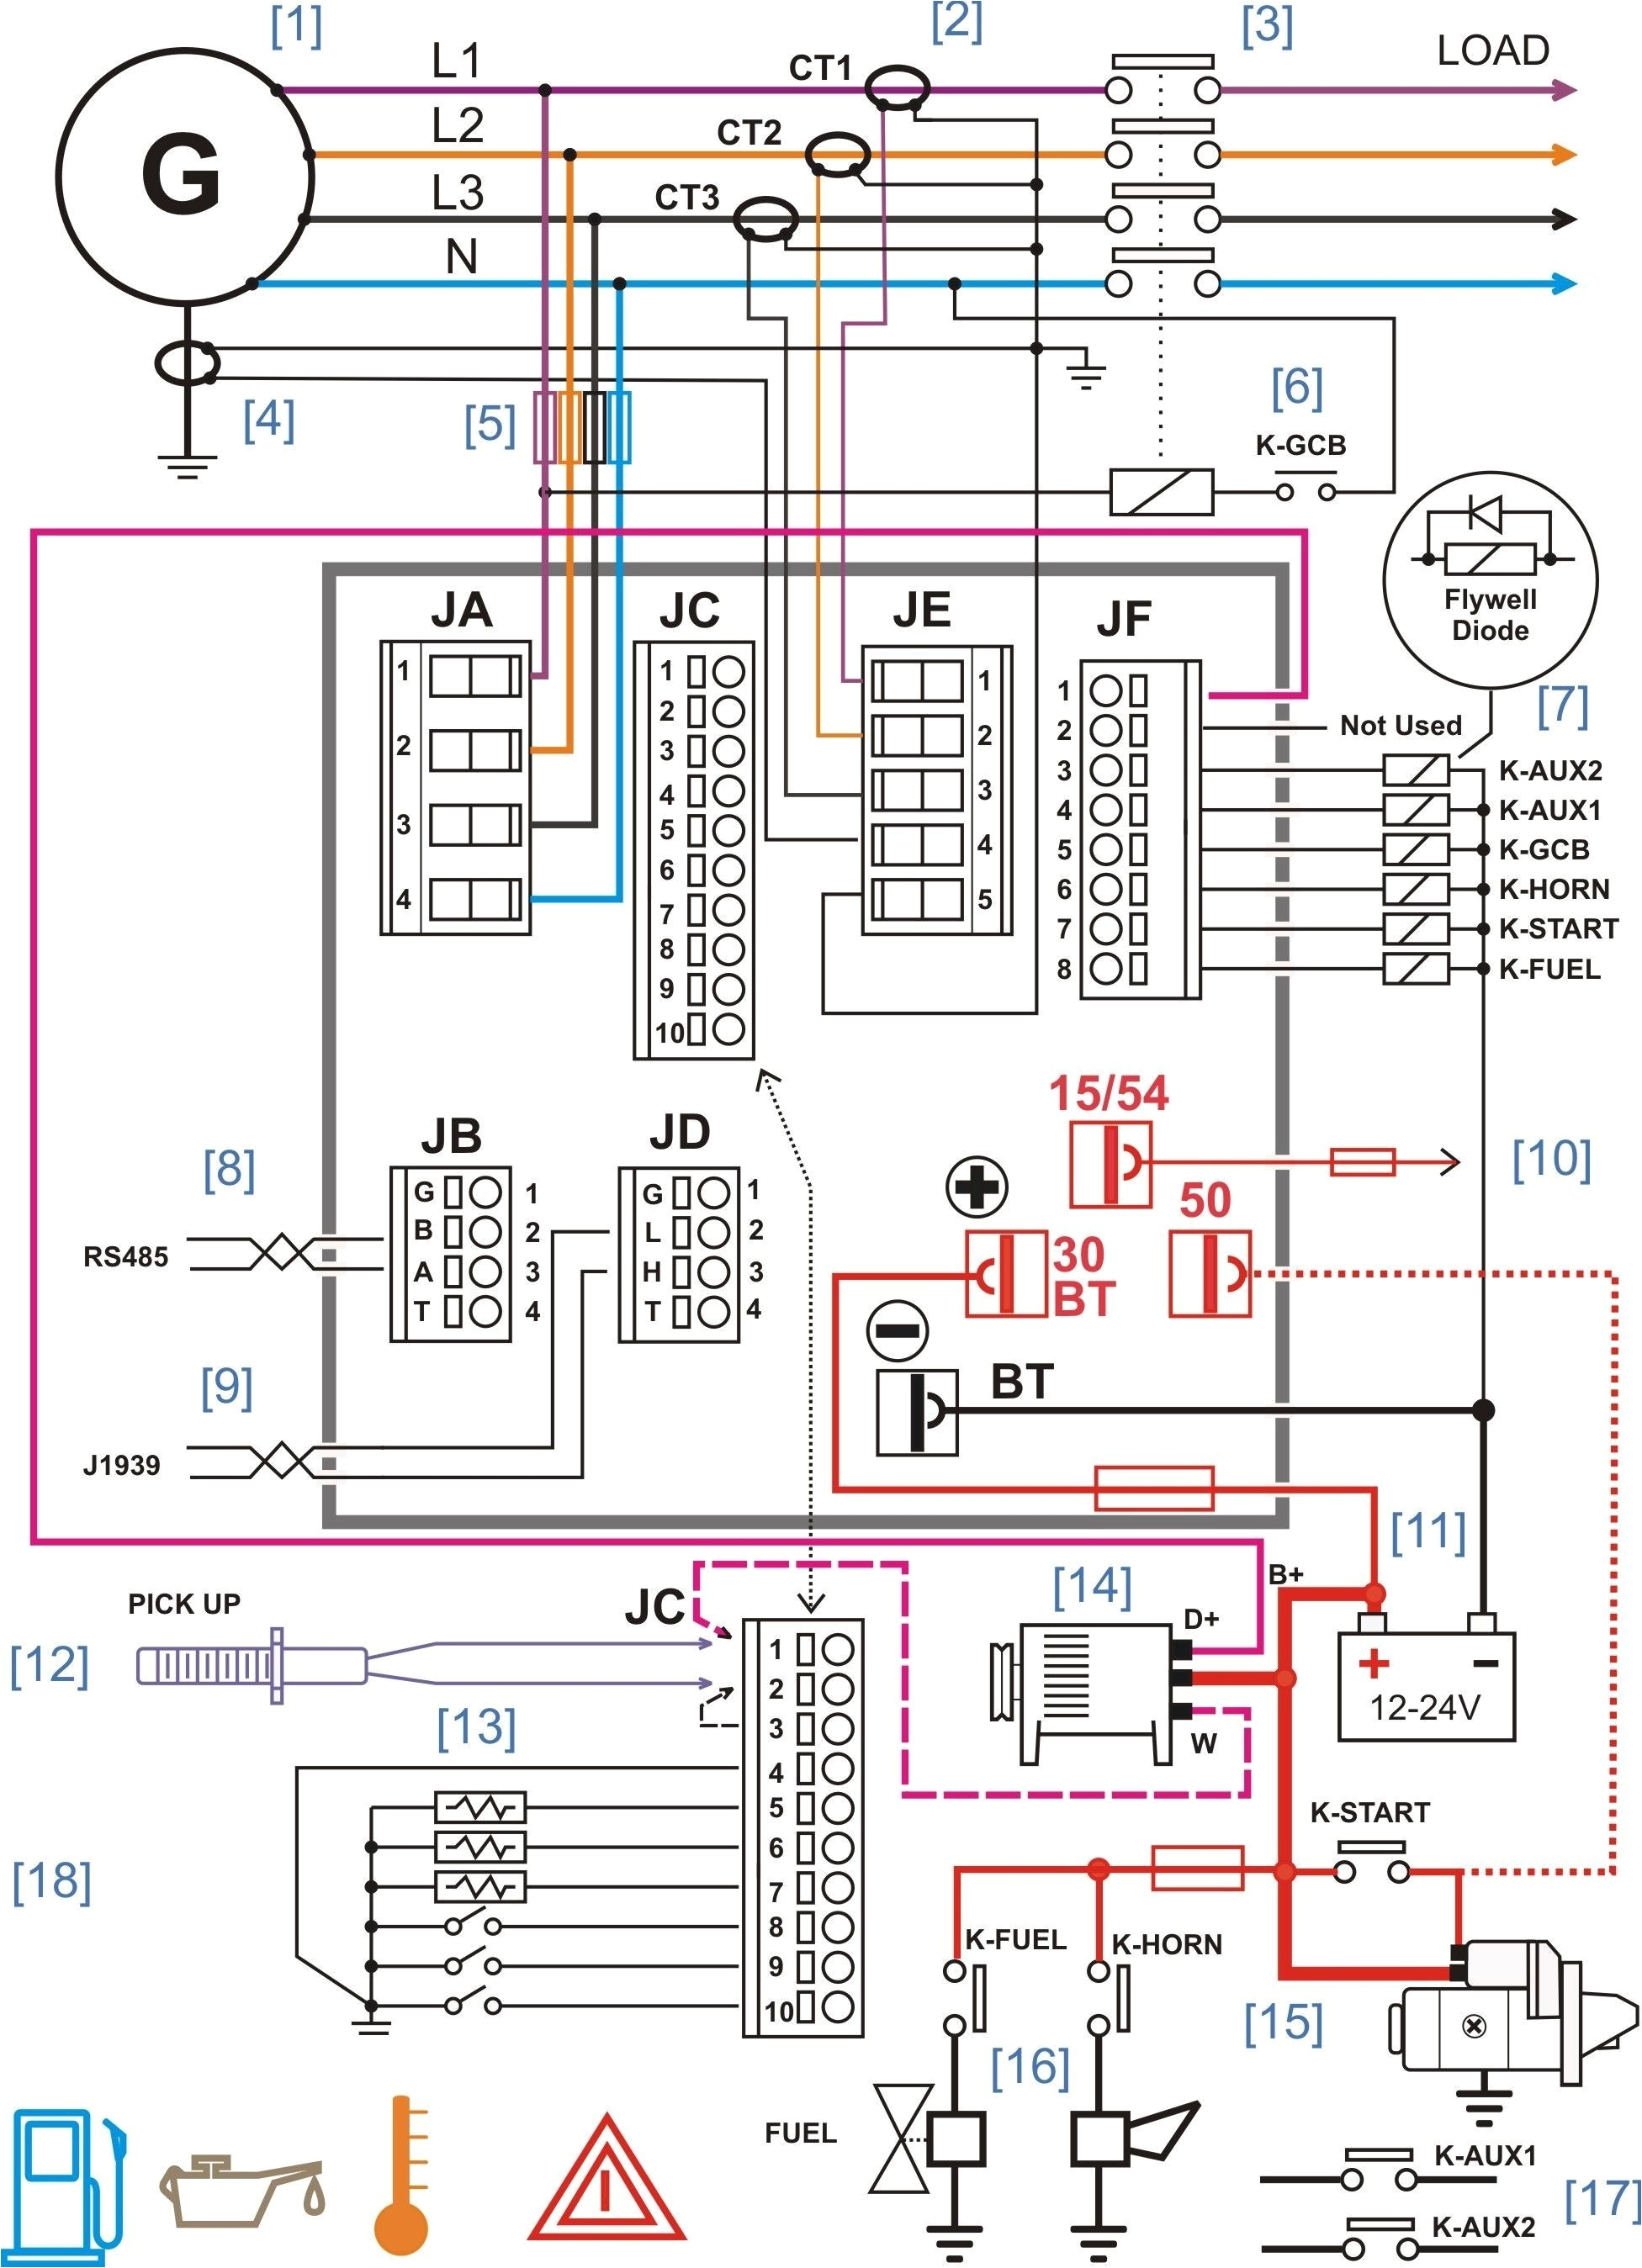 open concept wiring diagram wiring diagram home open concept wiring diagram source